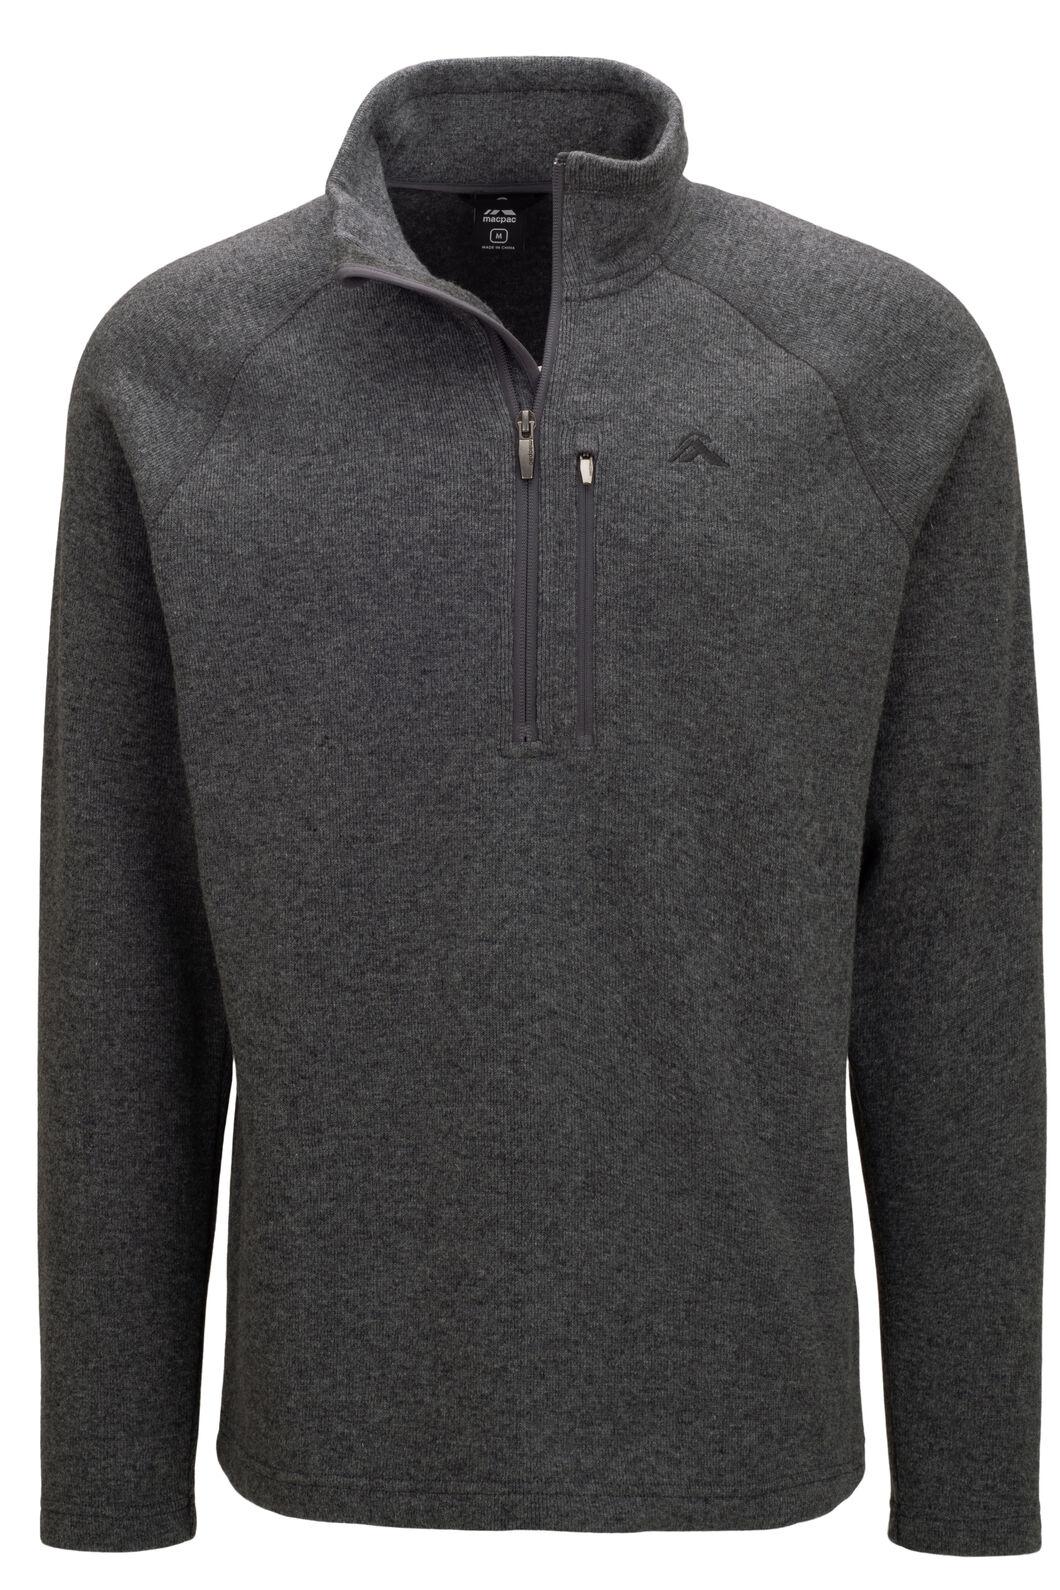 Macpac Men's Guyon Half Zip Pullover, Grey Marle, hi-res